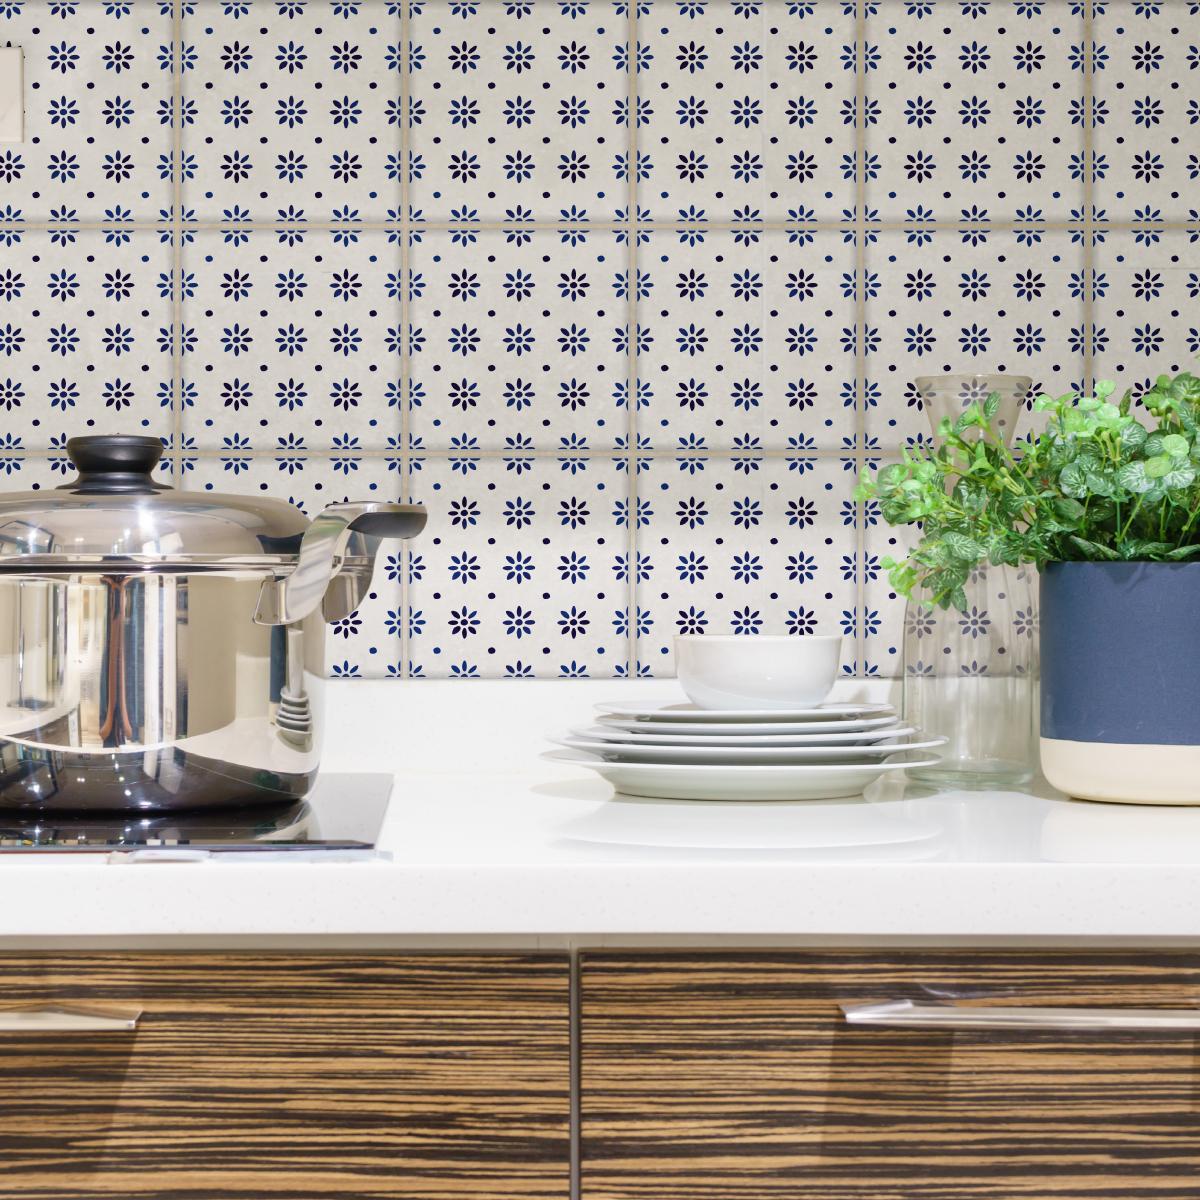 9 stickers carrelages delft hanovre cuisine carrelages ambiance sticker. Black Bedroom Furniture Sets. Home Design Ideas